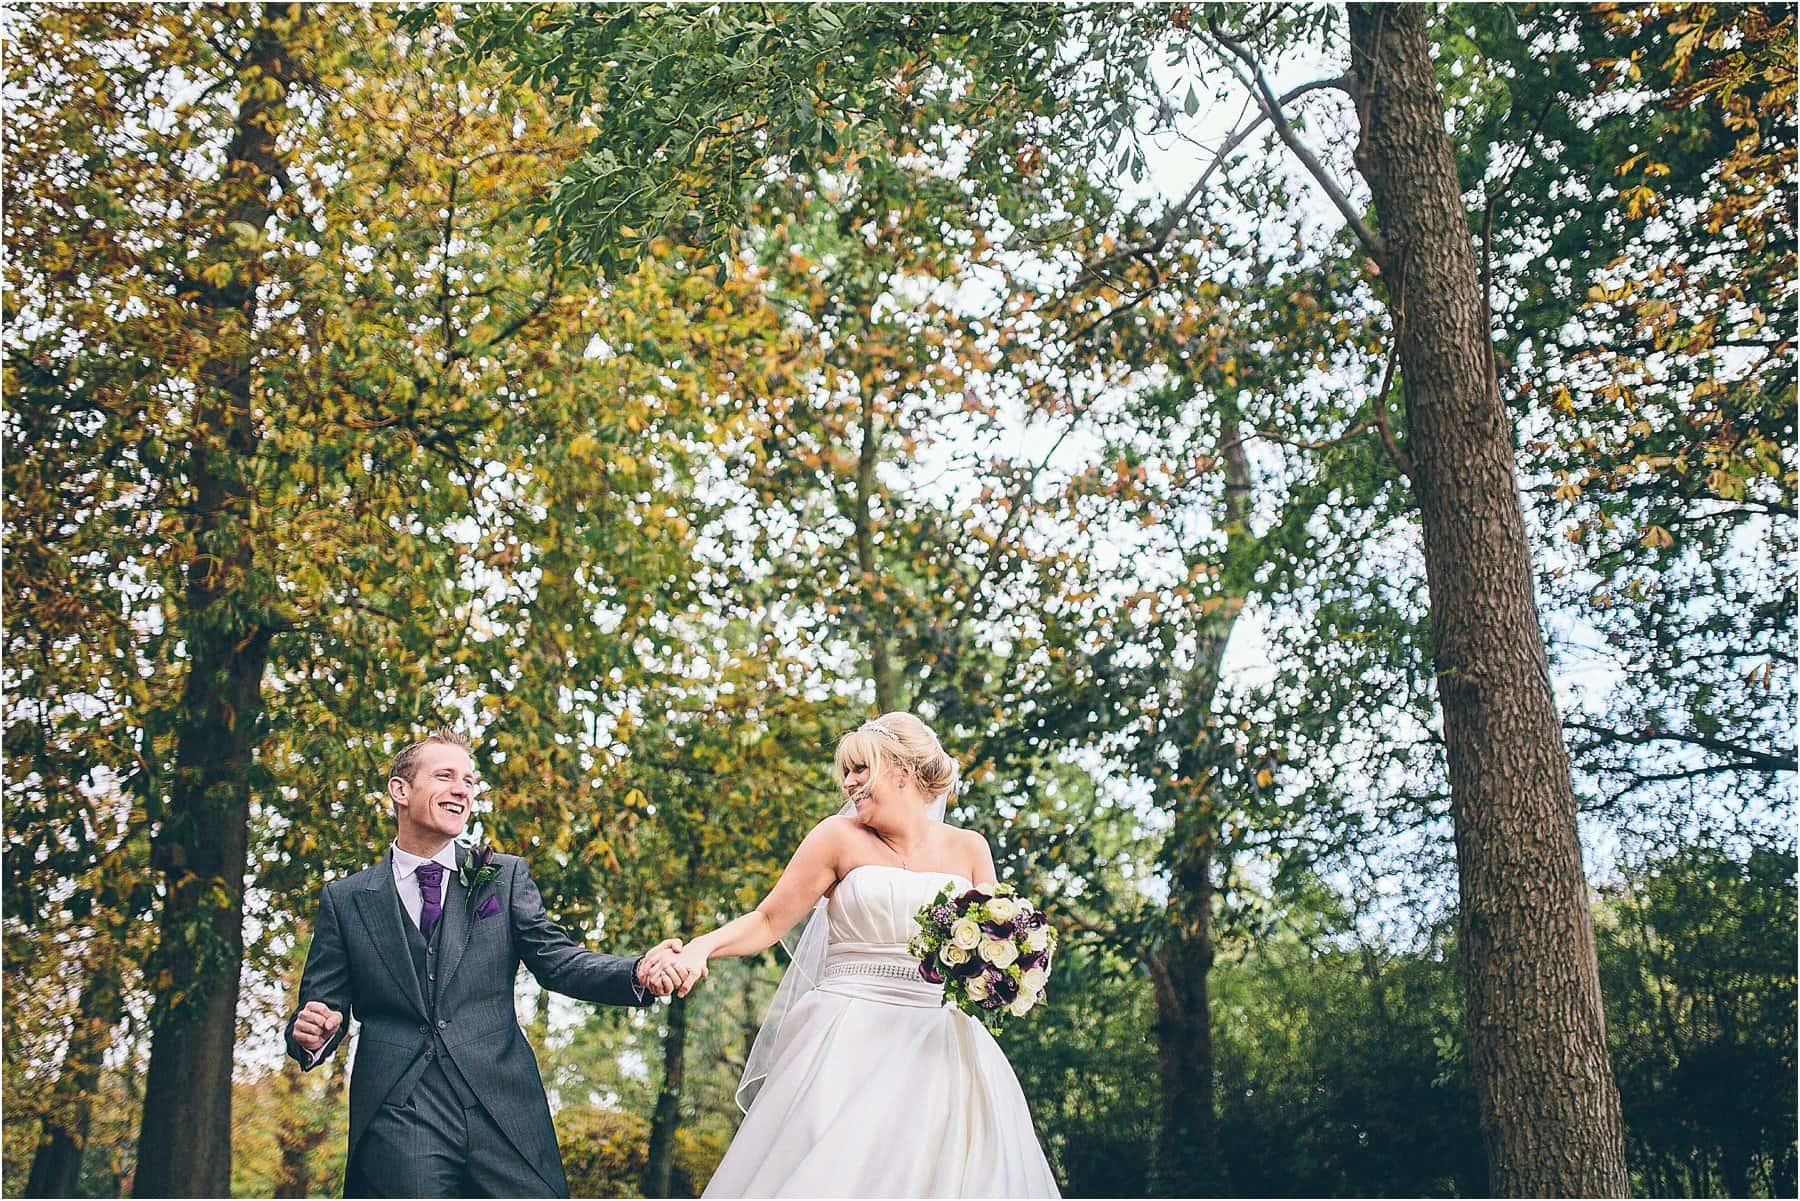 Crabwall_Manor_Wedding_Photography_0060